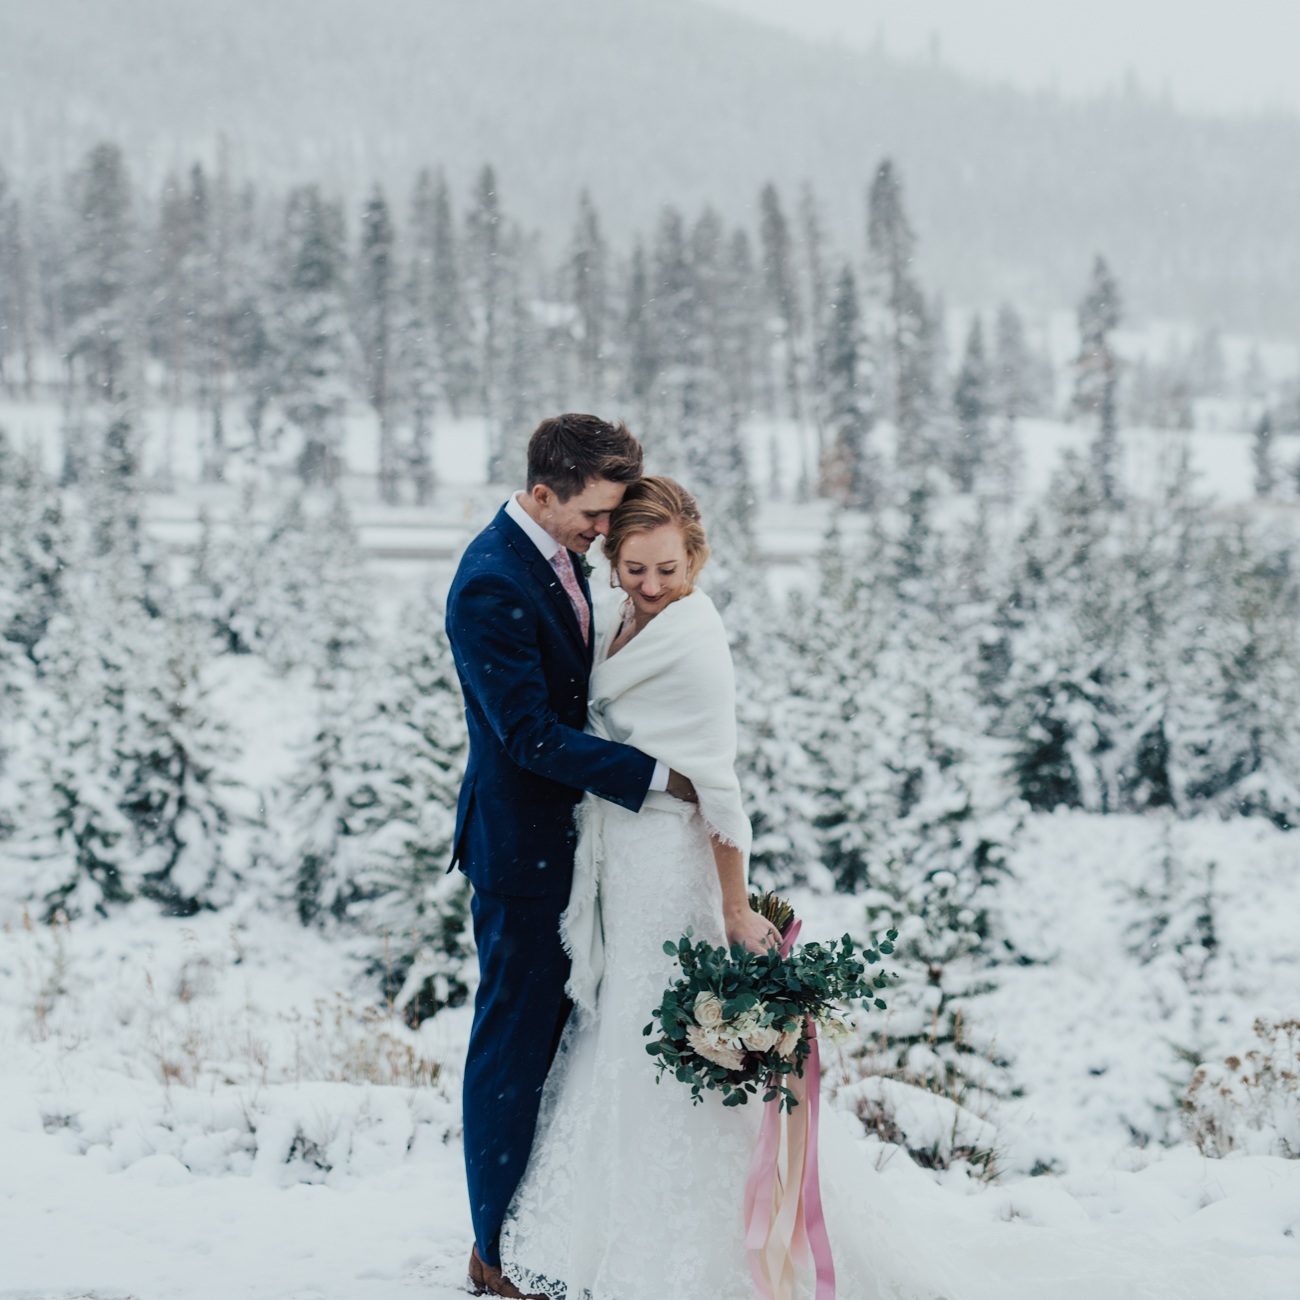 Billy + Kyleigh - // Wedding